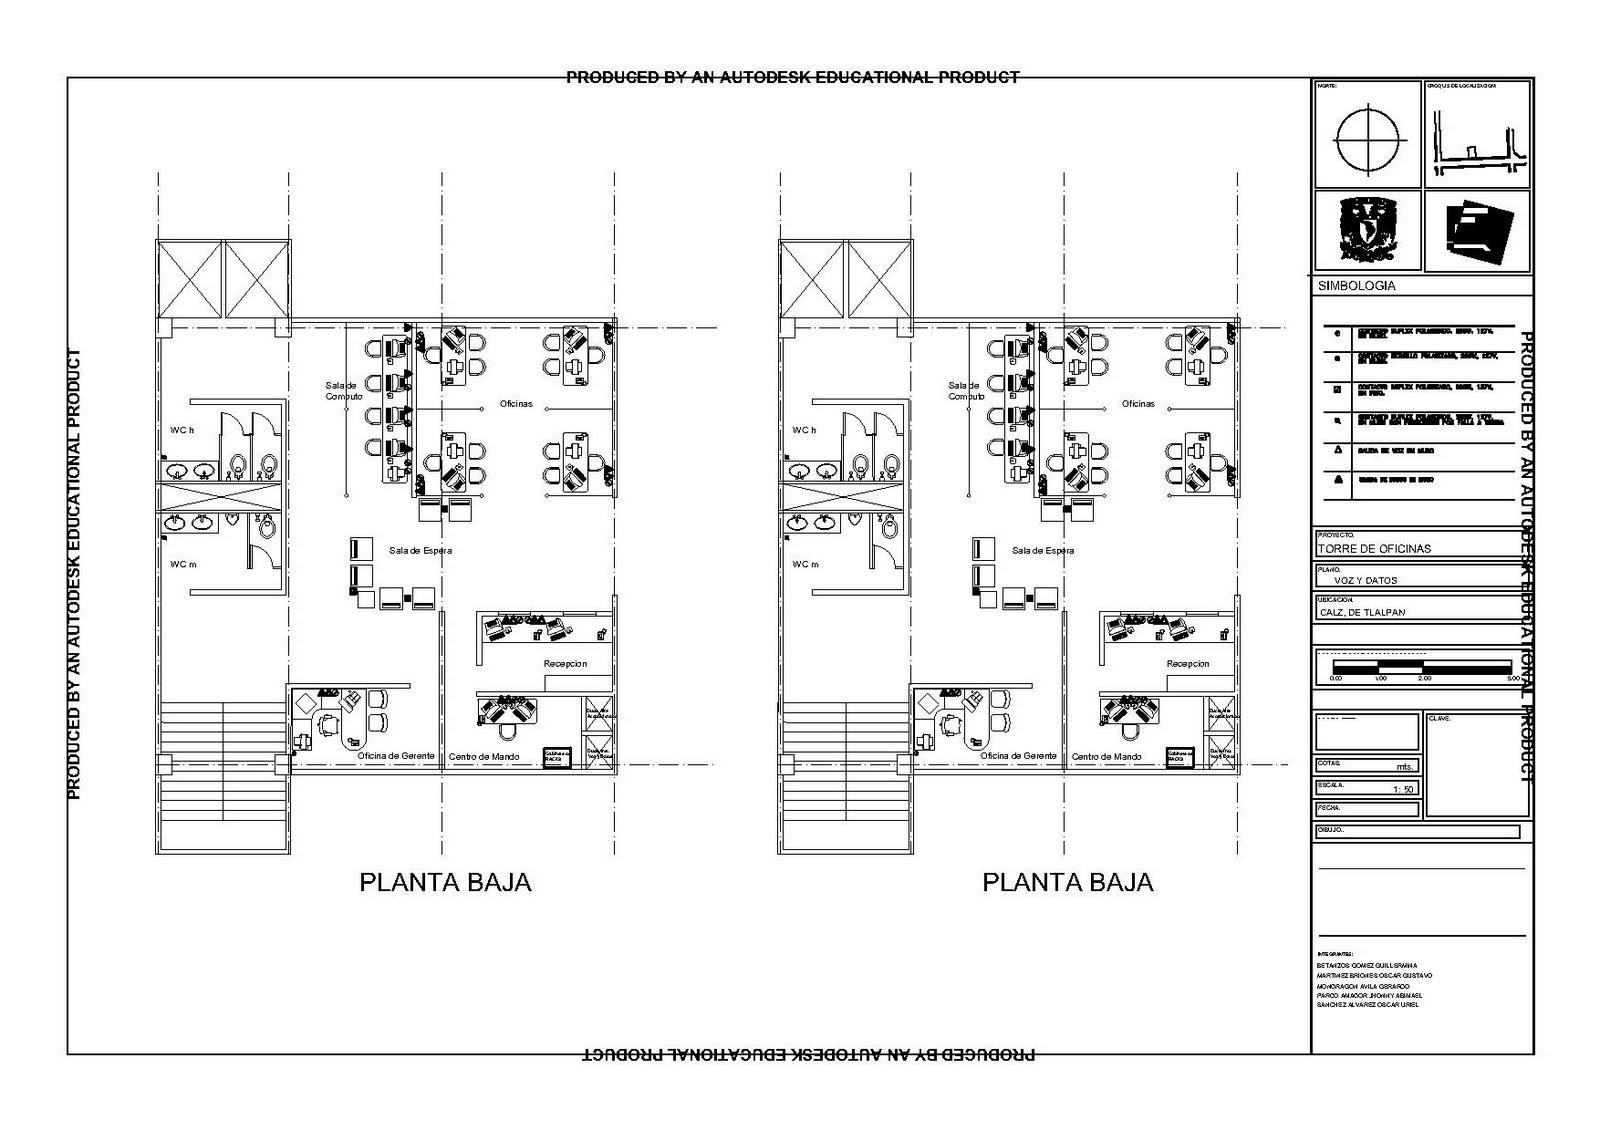 2002 polaris sportsman 500 ho wiring diagram 2003 predator 500 wiring diagram 2004 polaris predator 500 [ 1600 x 1131 Pixel ]